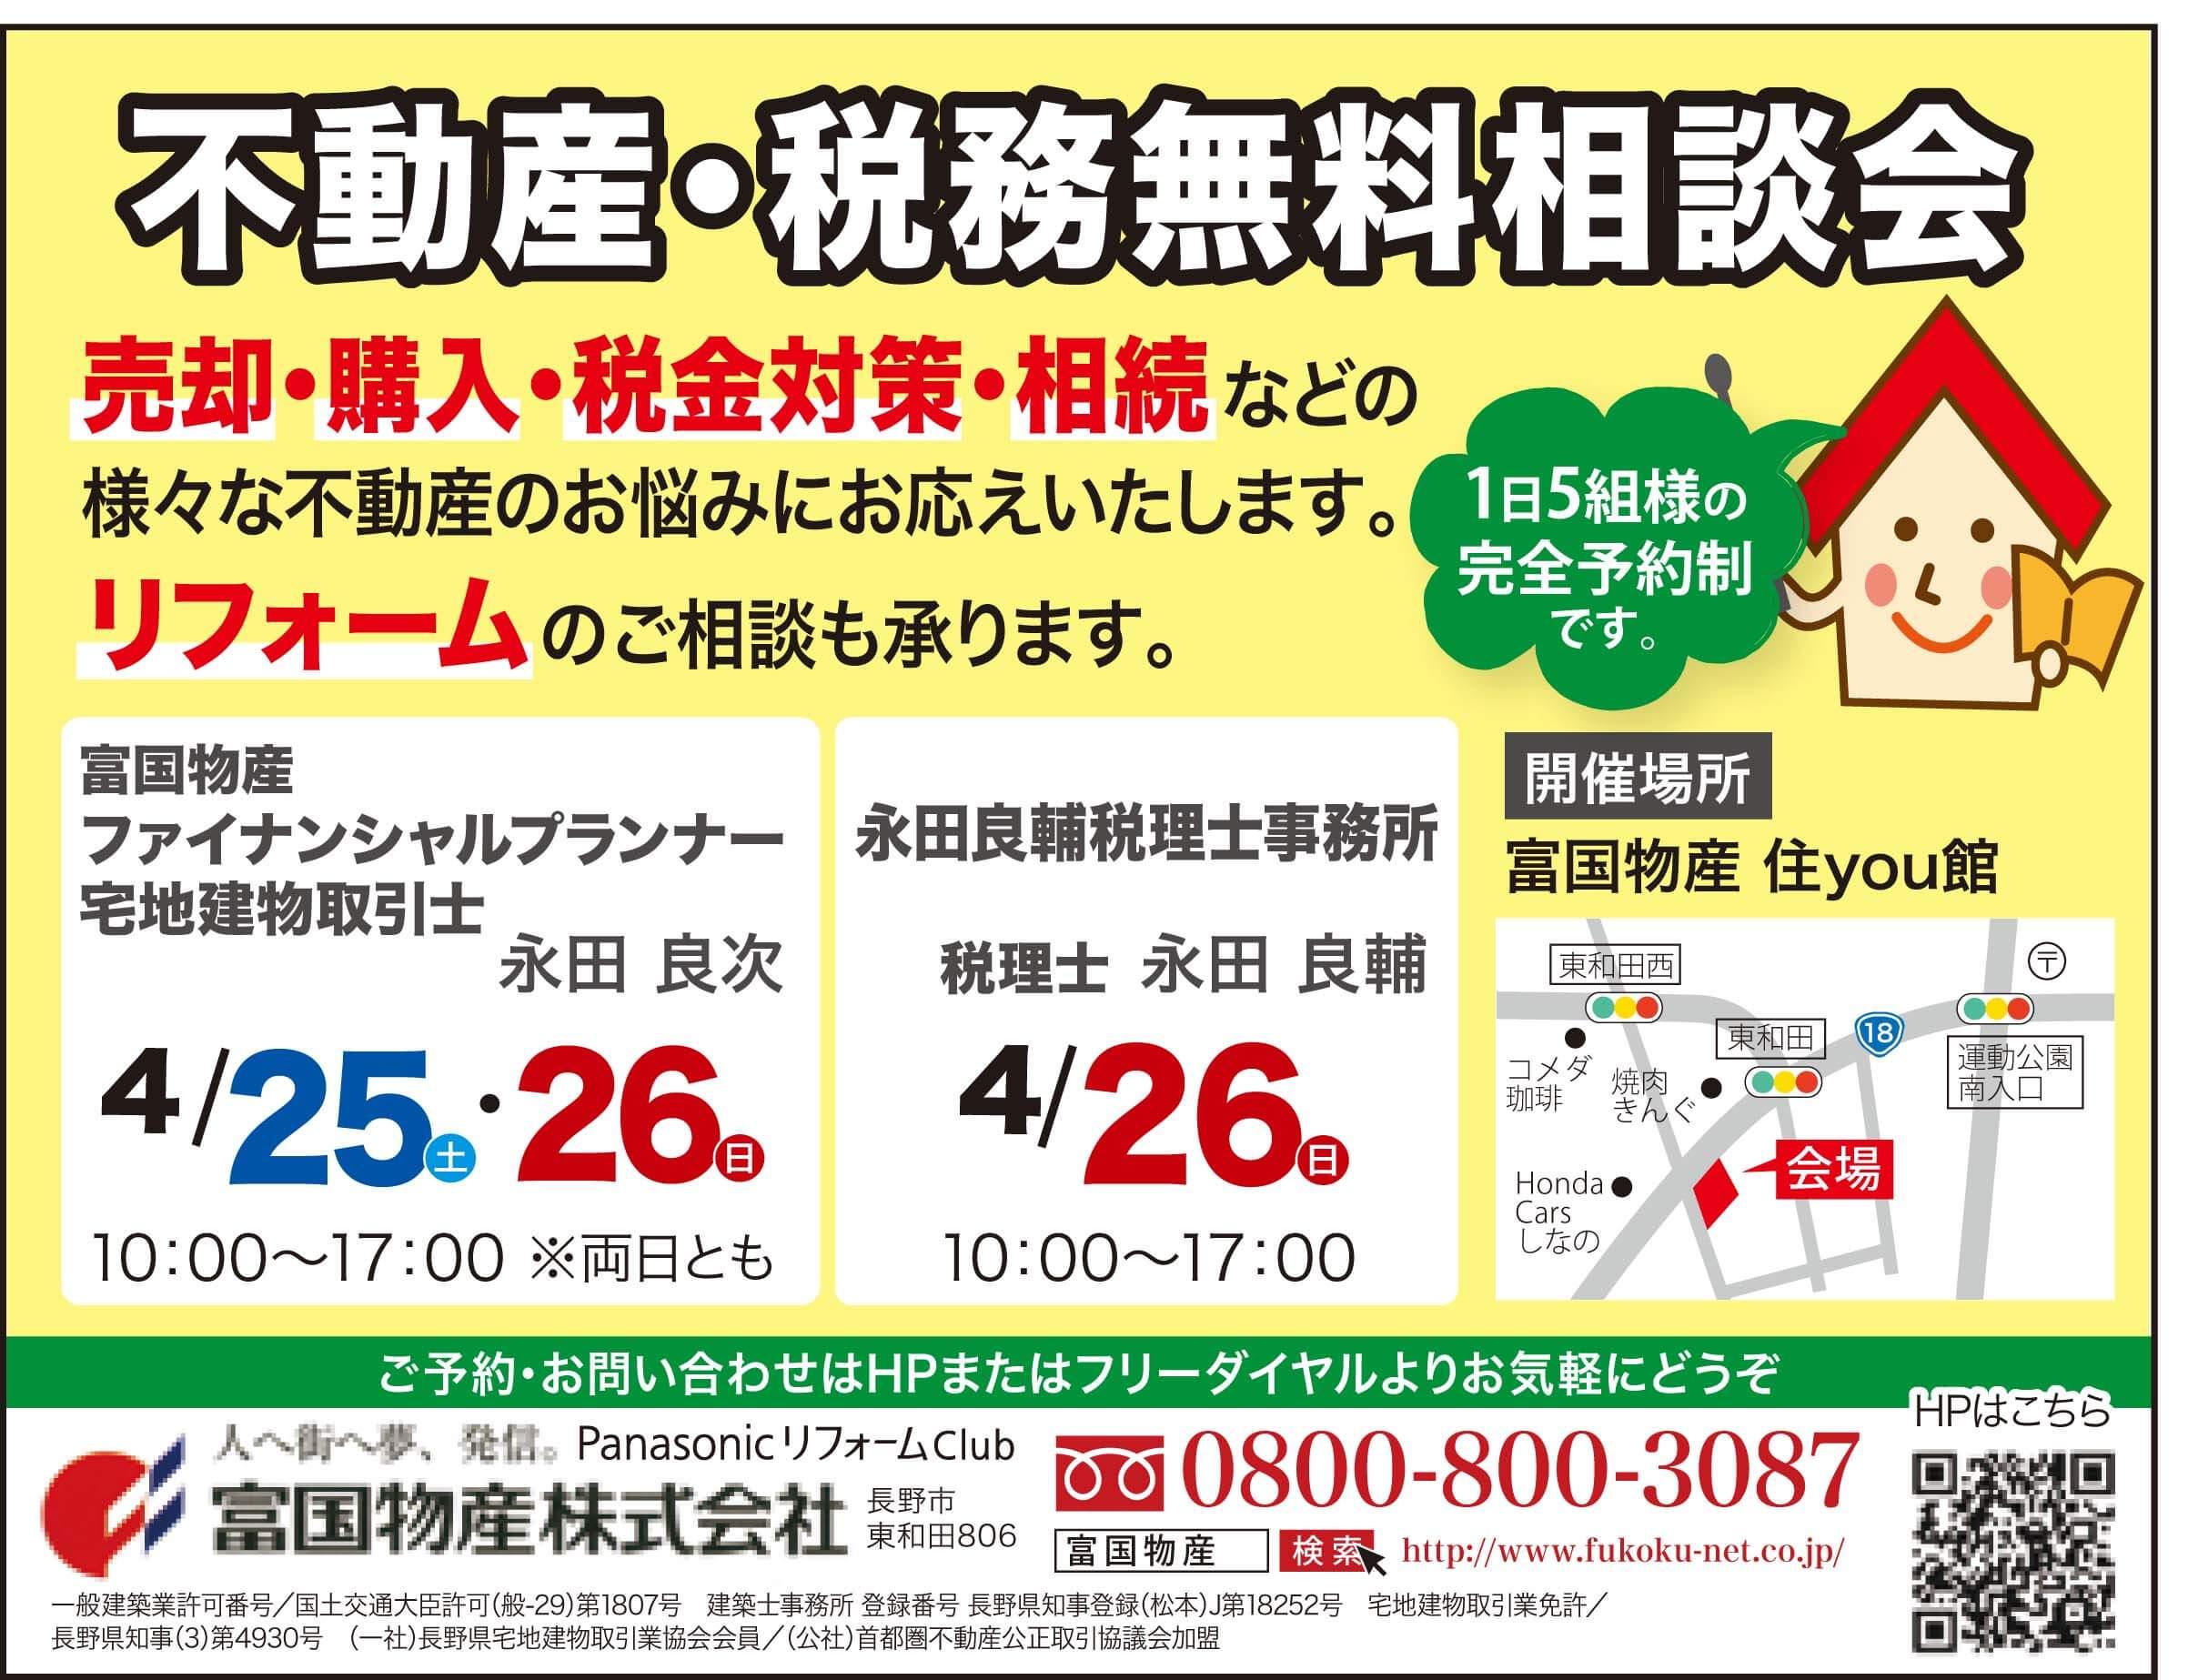 http://www.fukoku-net.co.jp/wp/wp-content/uploads/2020/04/67dc1b79985c20c864f3cfc741449797.jpg